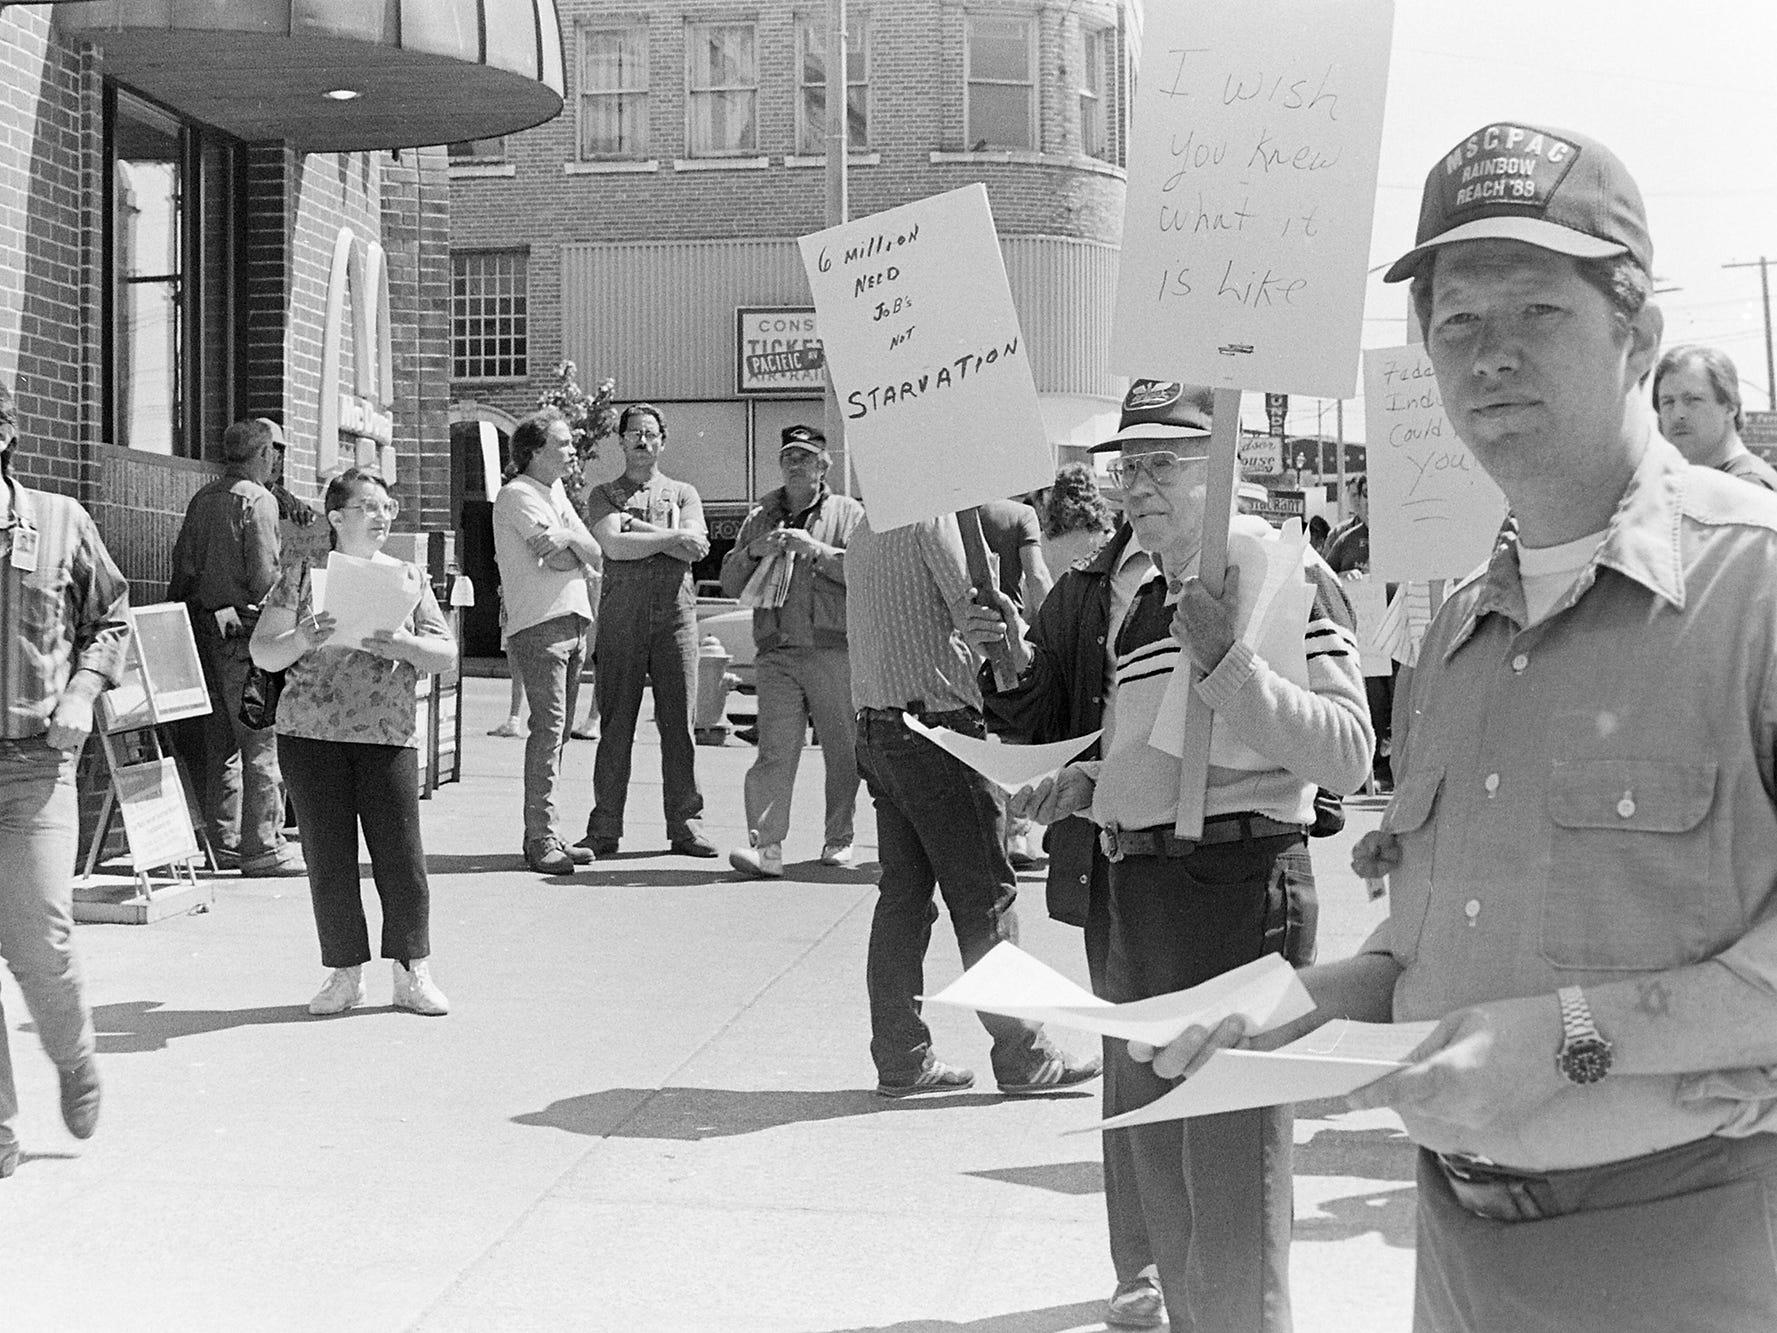 05/21/88PSNS Protest